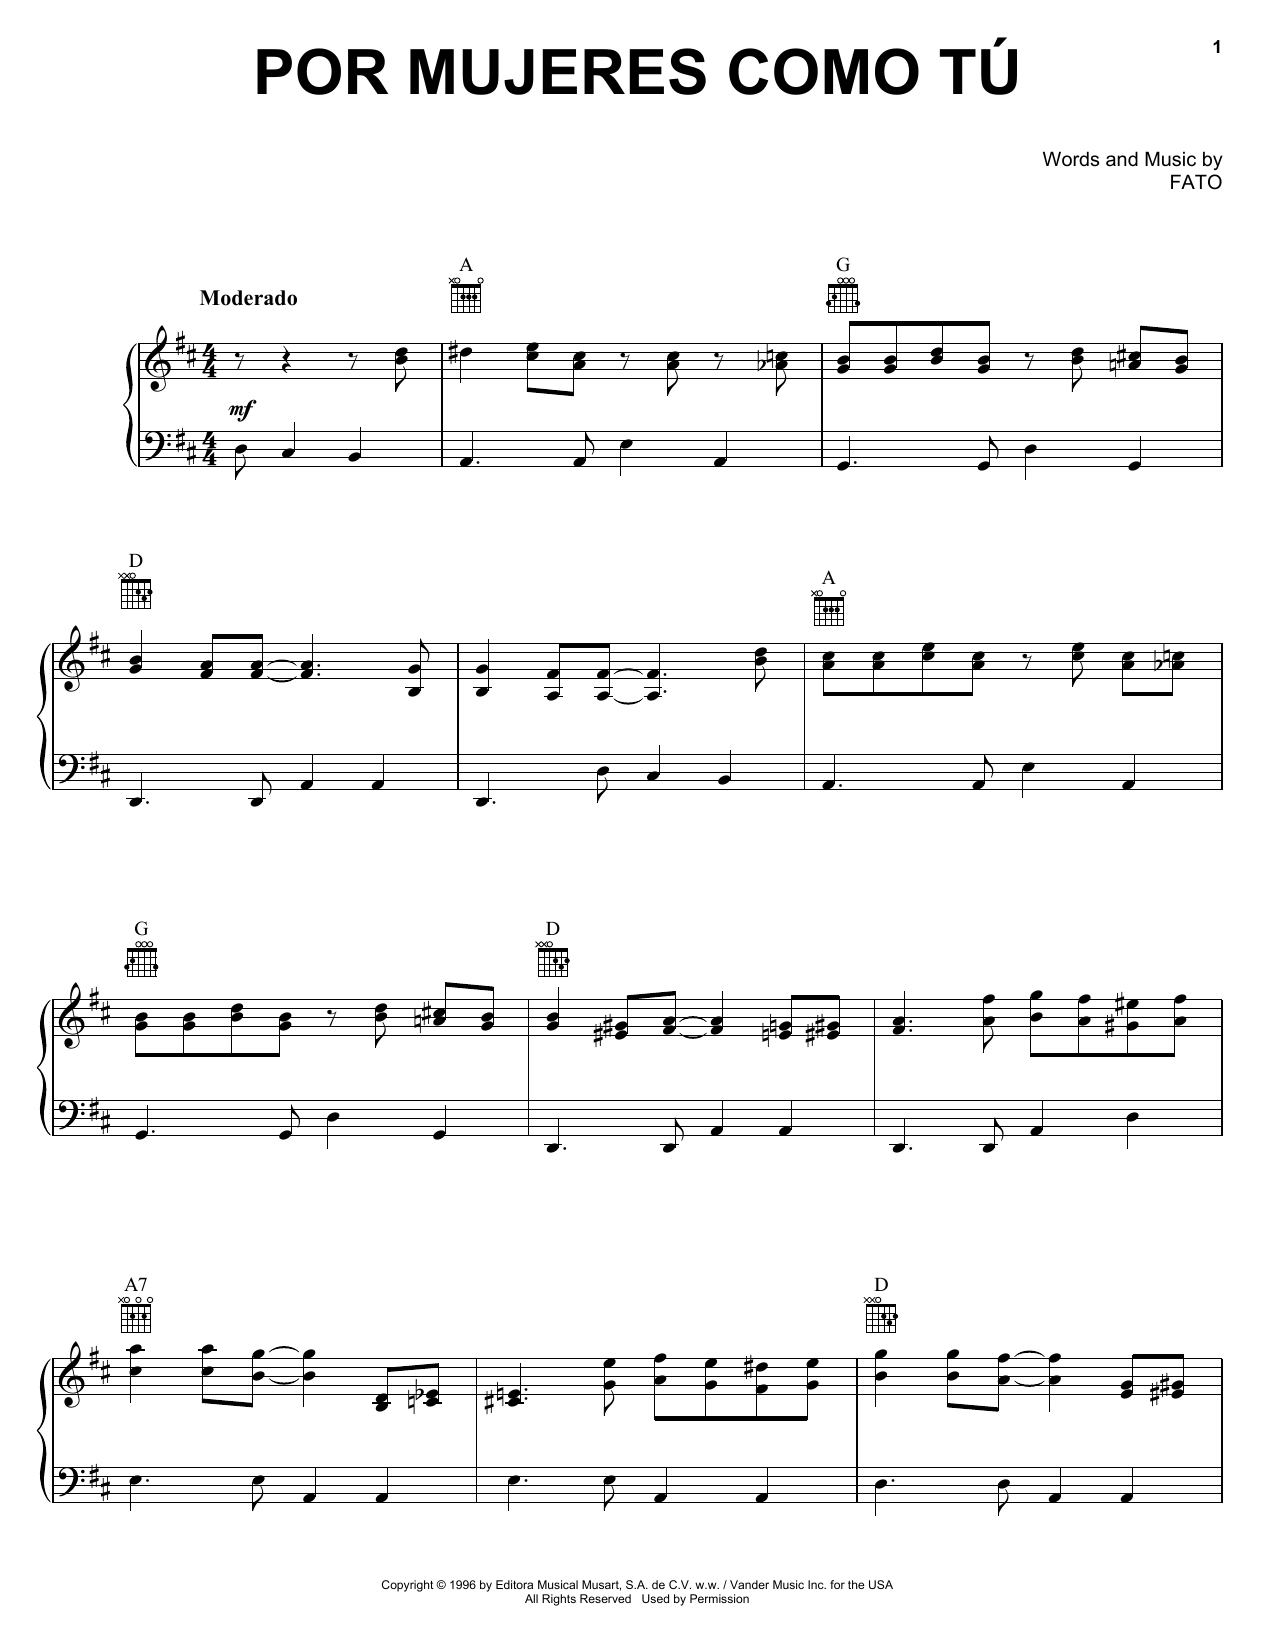 FATO Por Mujeres Como Tu sheet music notes and chords. Download Printable PDF.